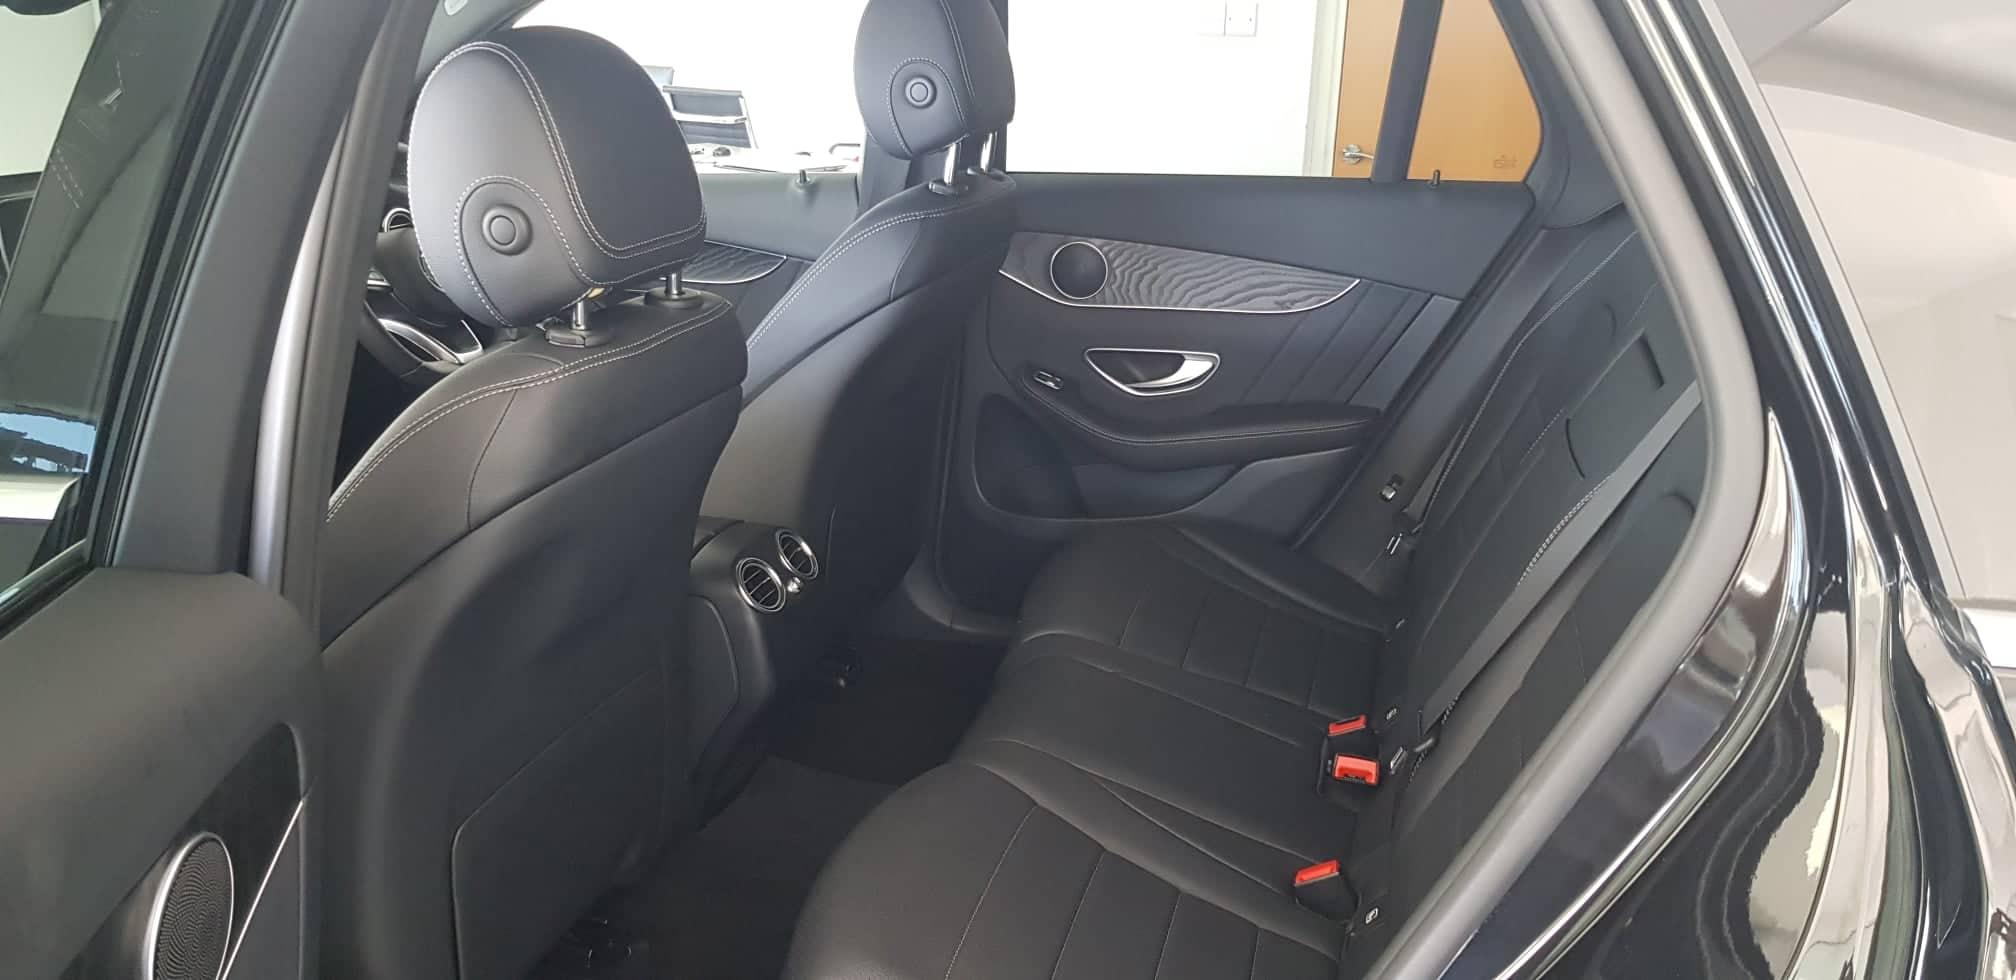 MERCEDES GLC 250D AMG